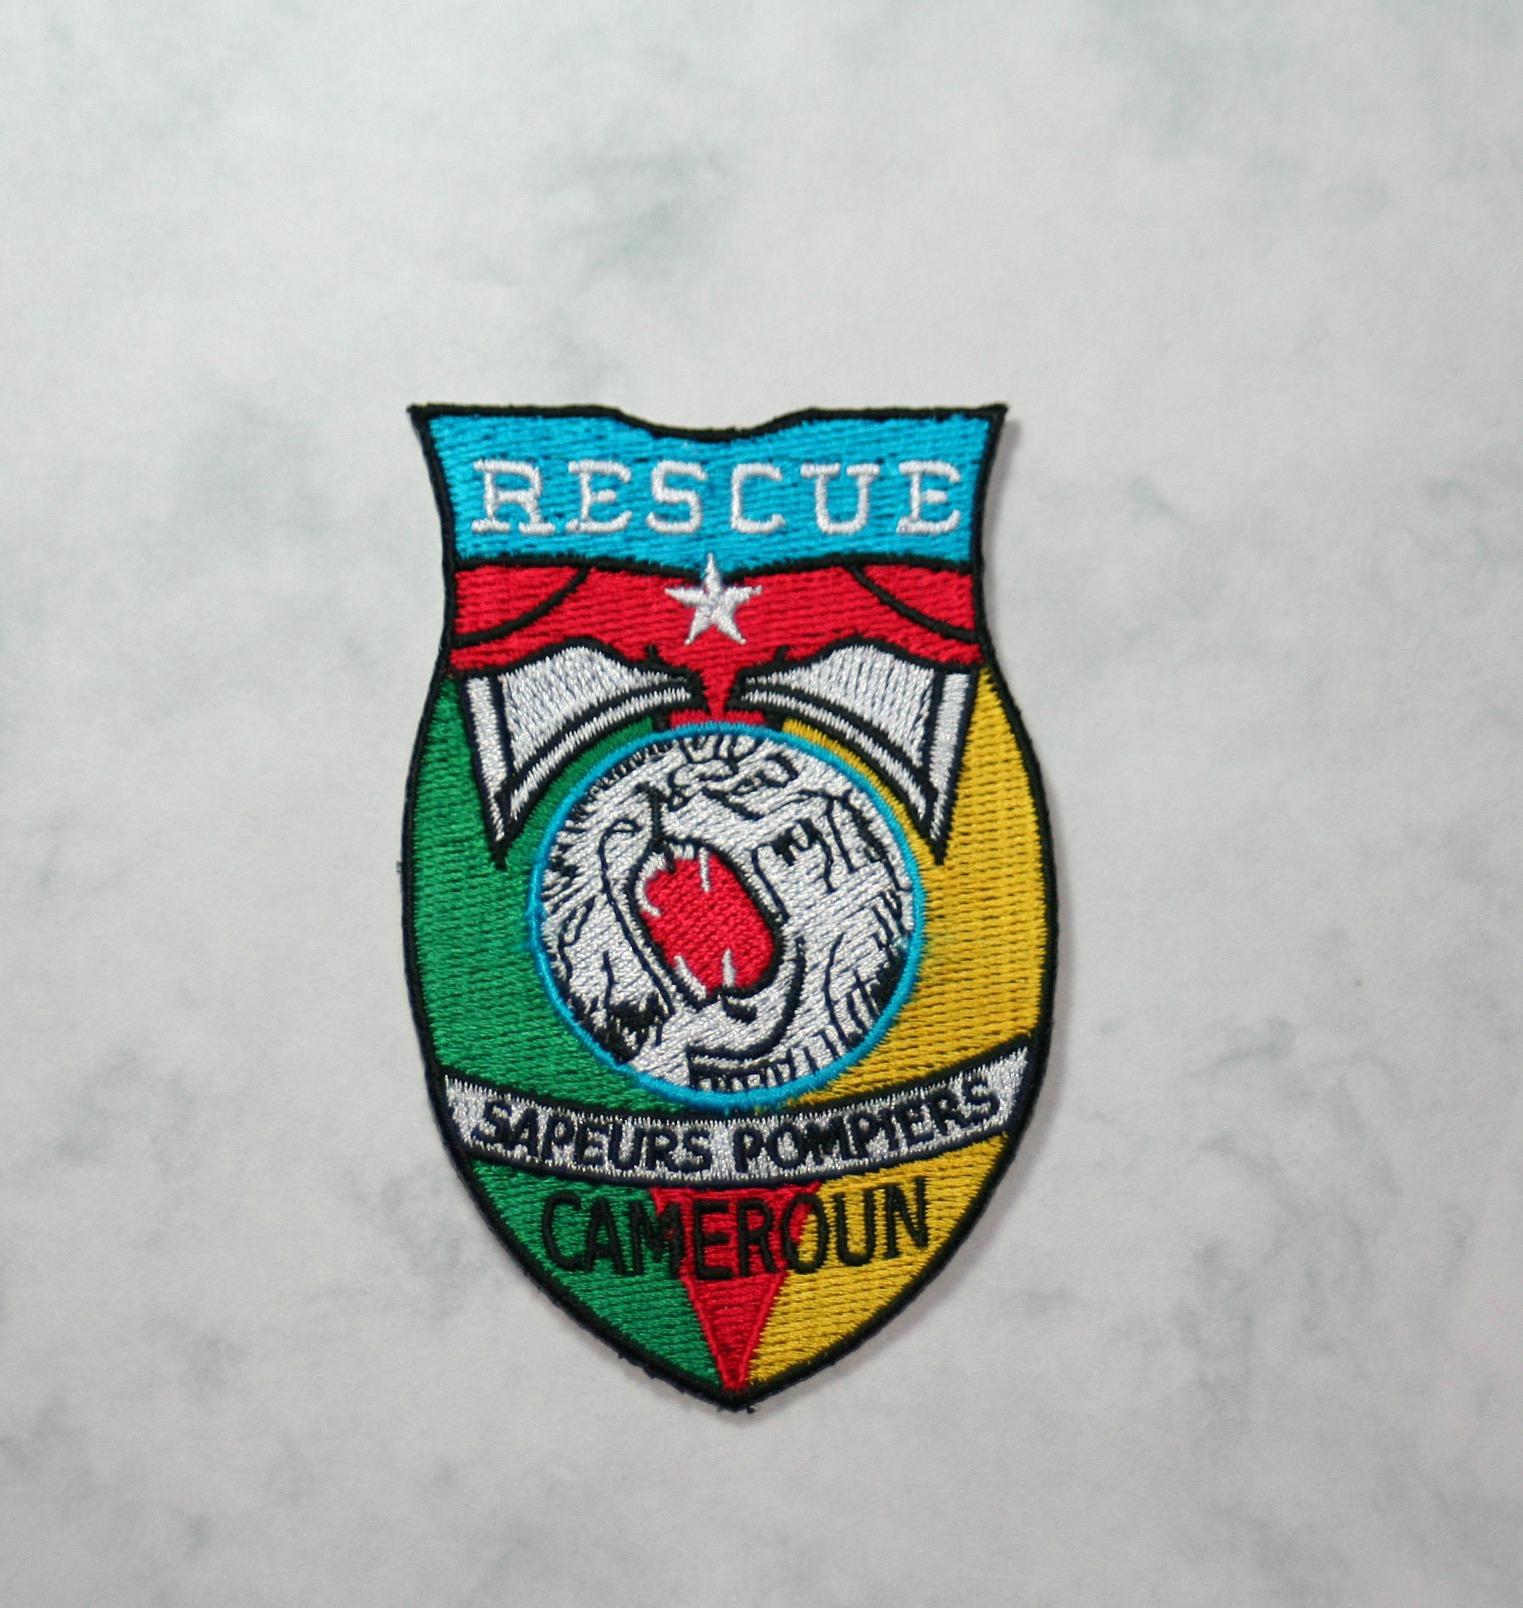 Cameroun Fire Brigade Rescue